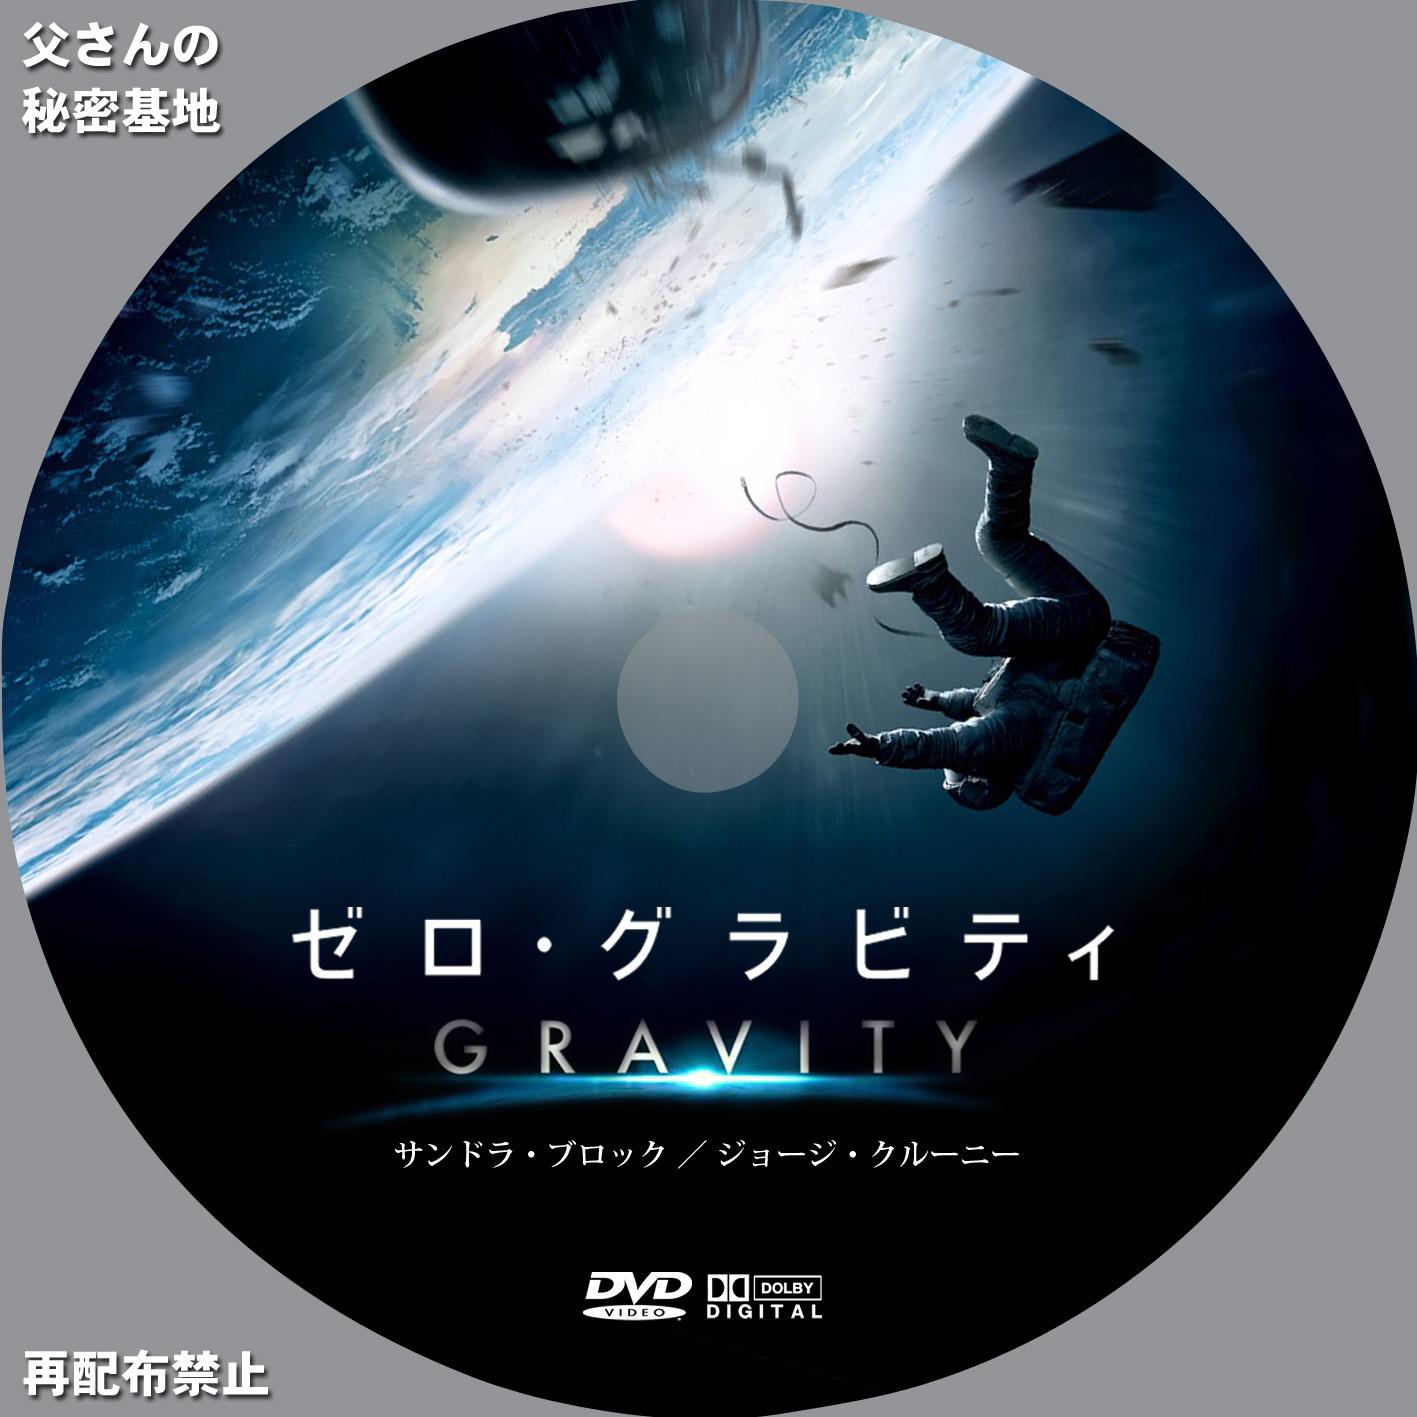 gravity_B_DVD.jpg